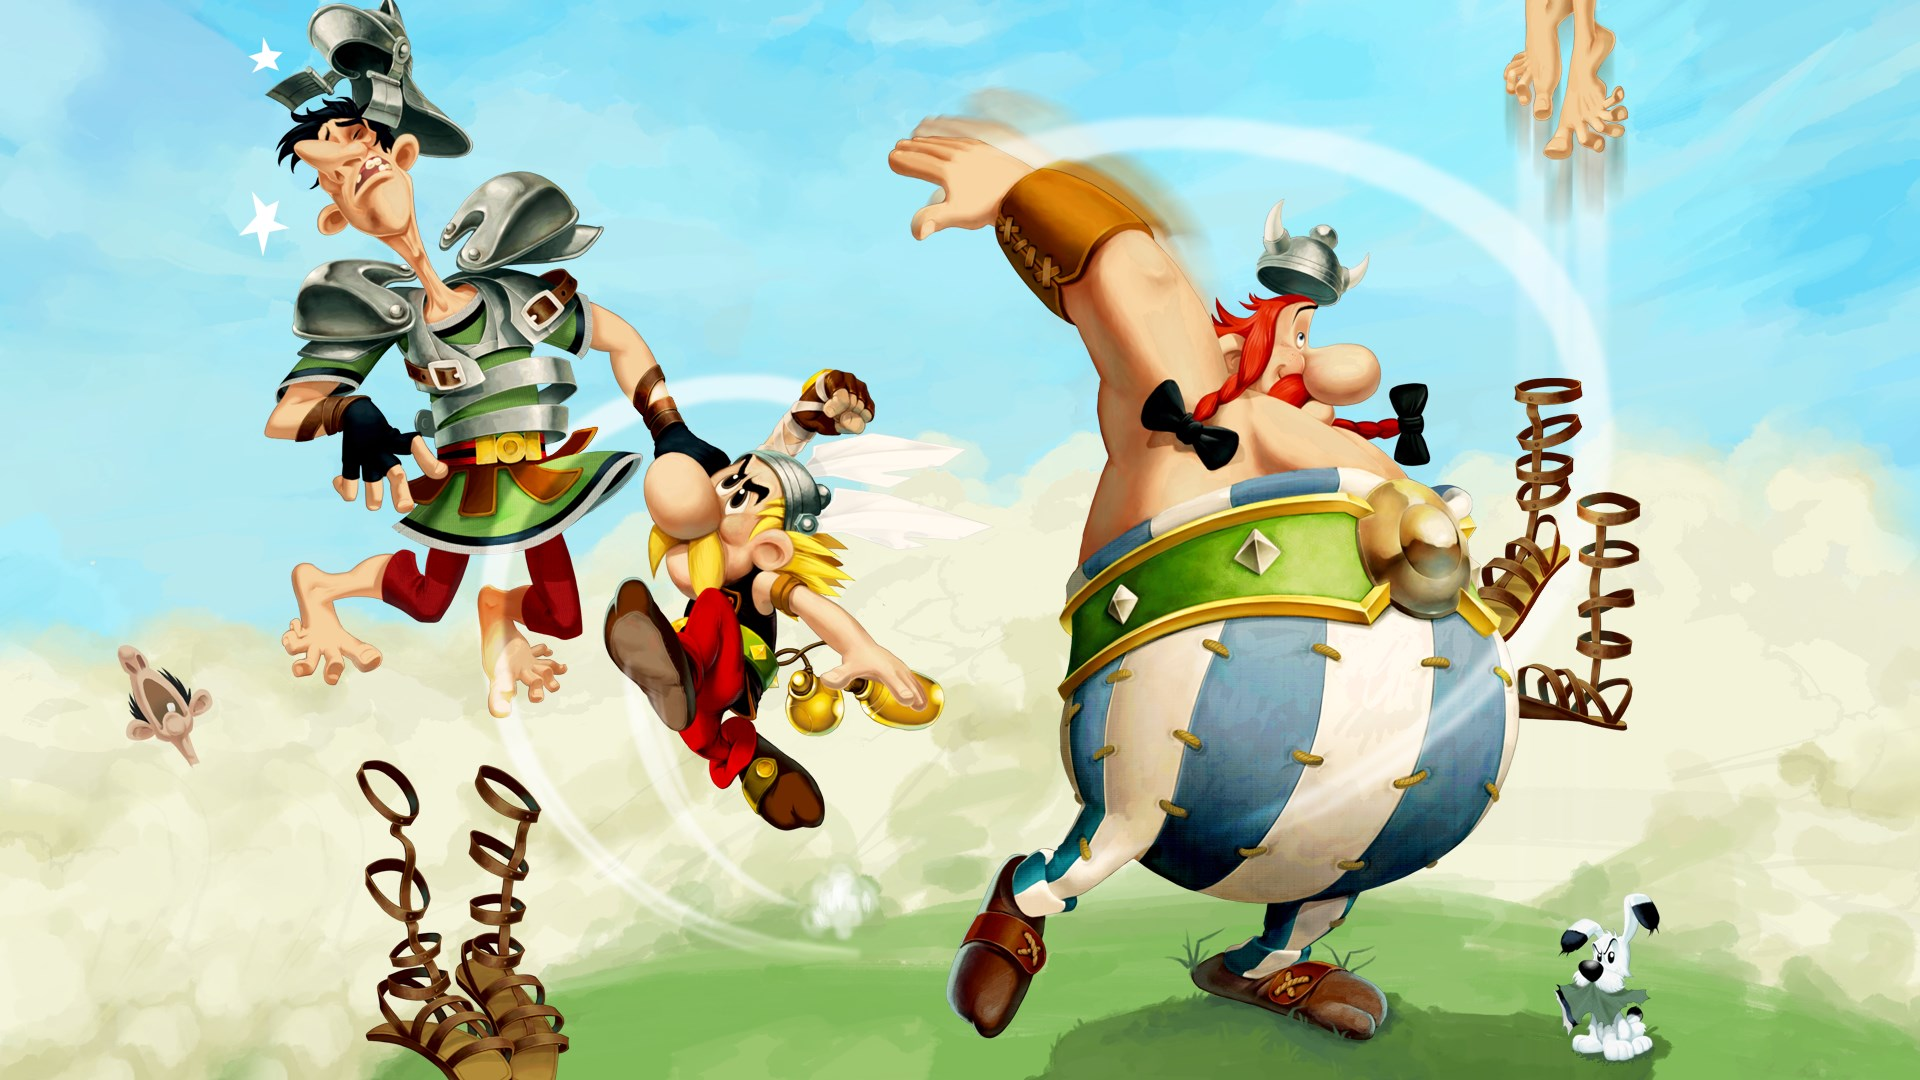 Buy Asterix Obelix Xxl 2 Microsoft Store En Gb